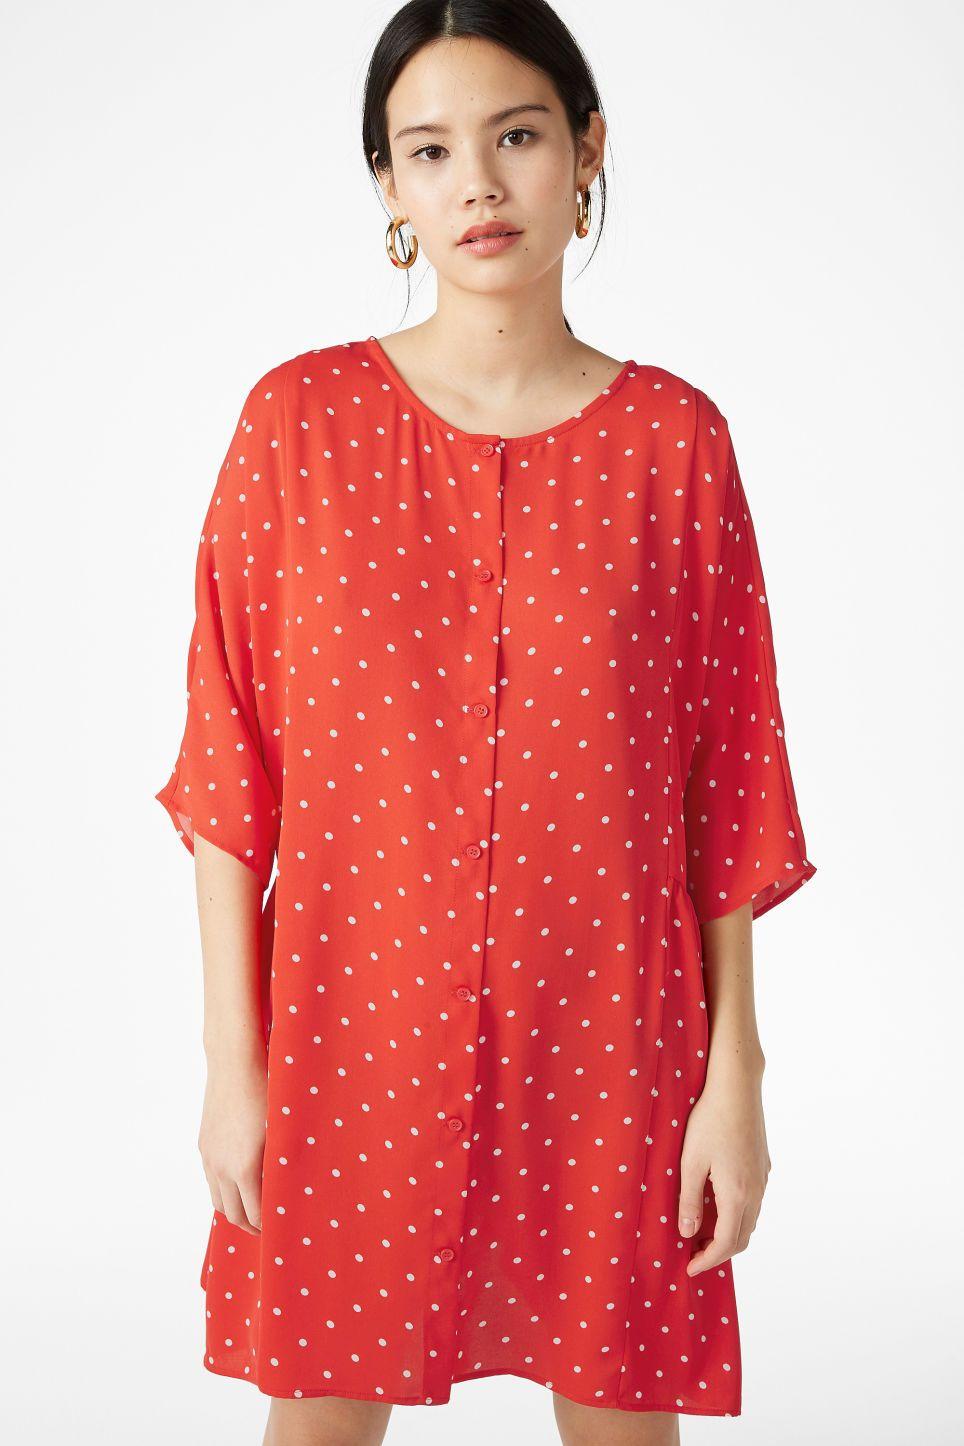 An oversized unu flowy kneelength dress with length sleeves and